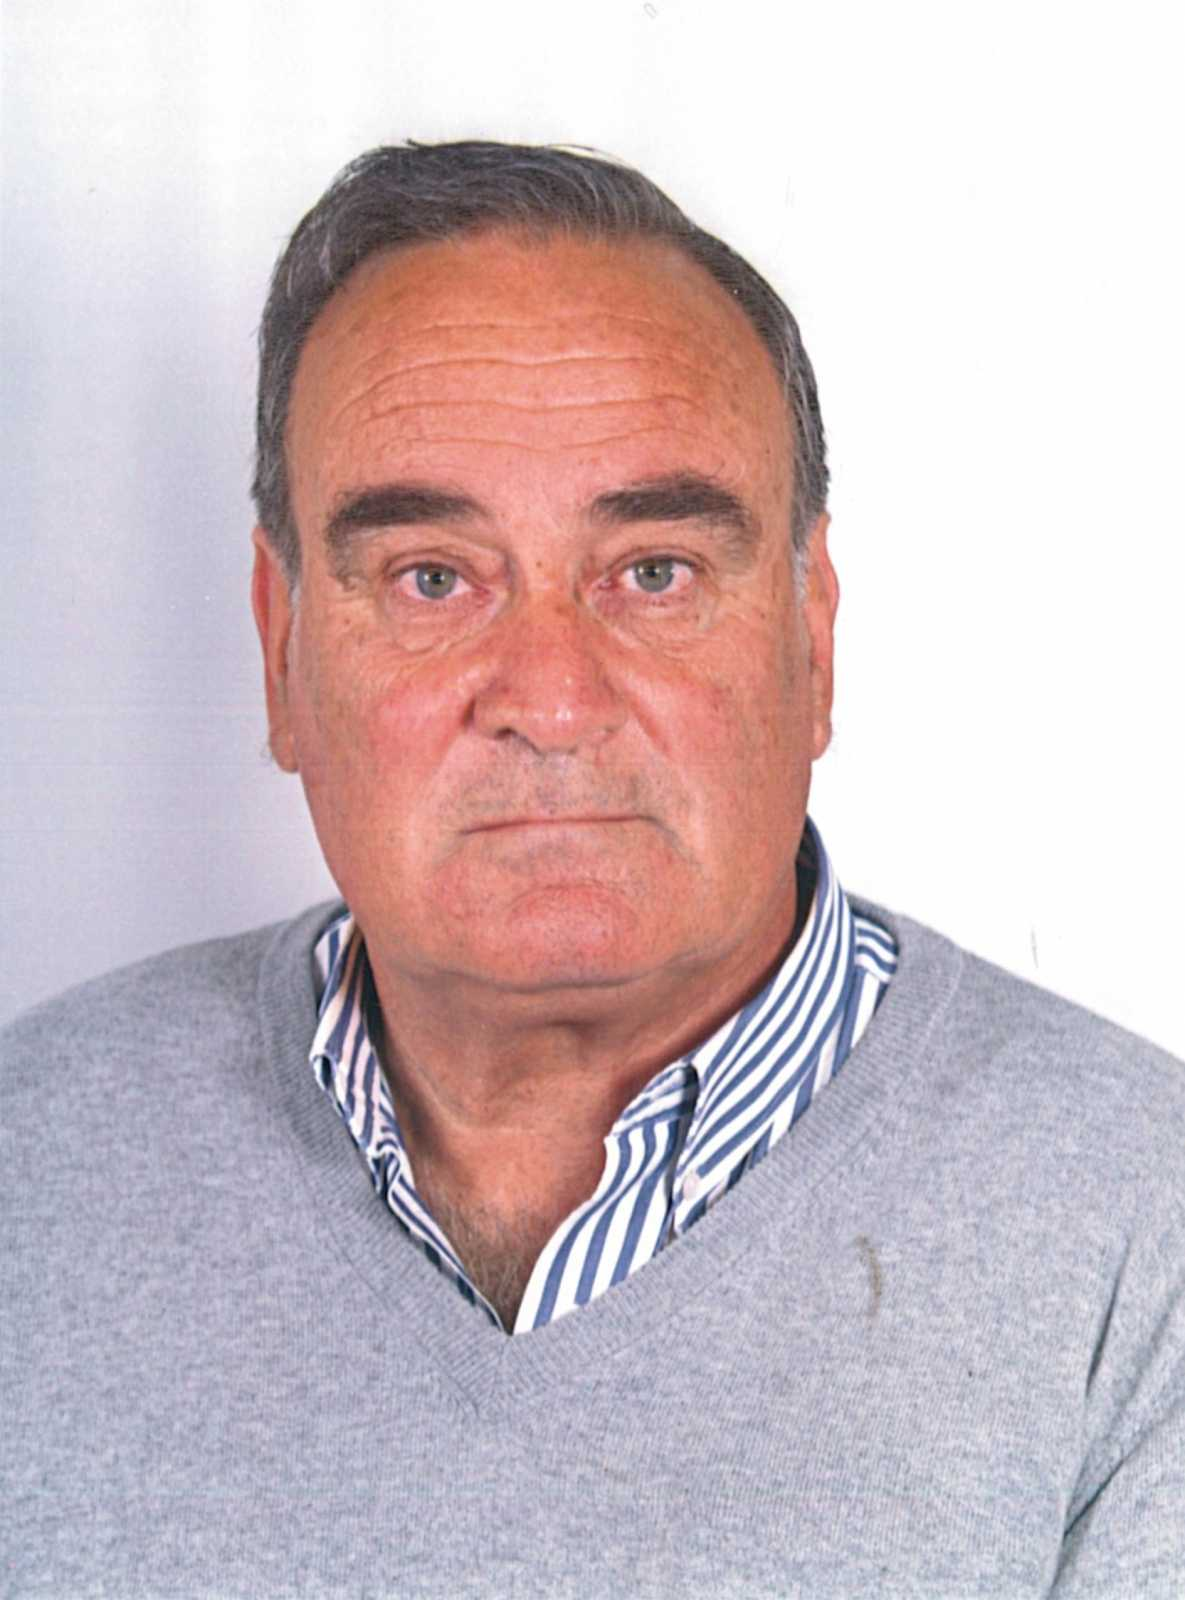 Mario Mateus Pinto Torradinho